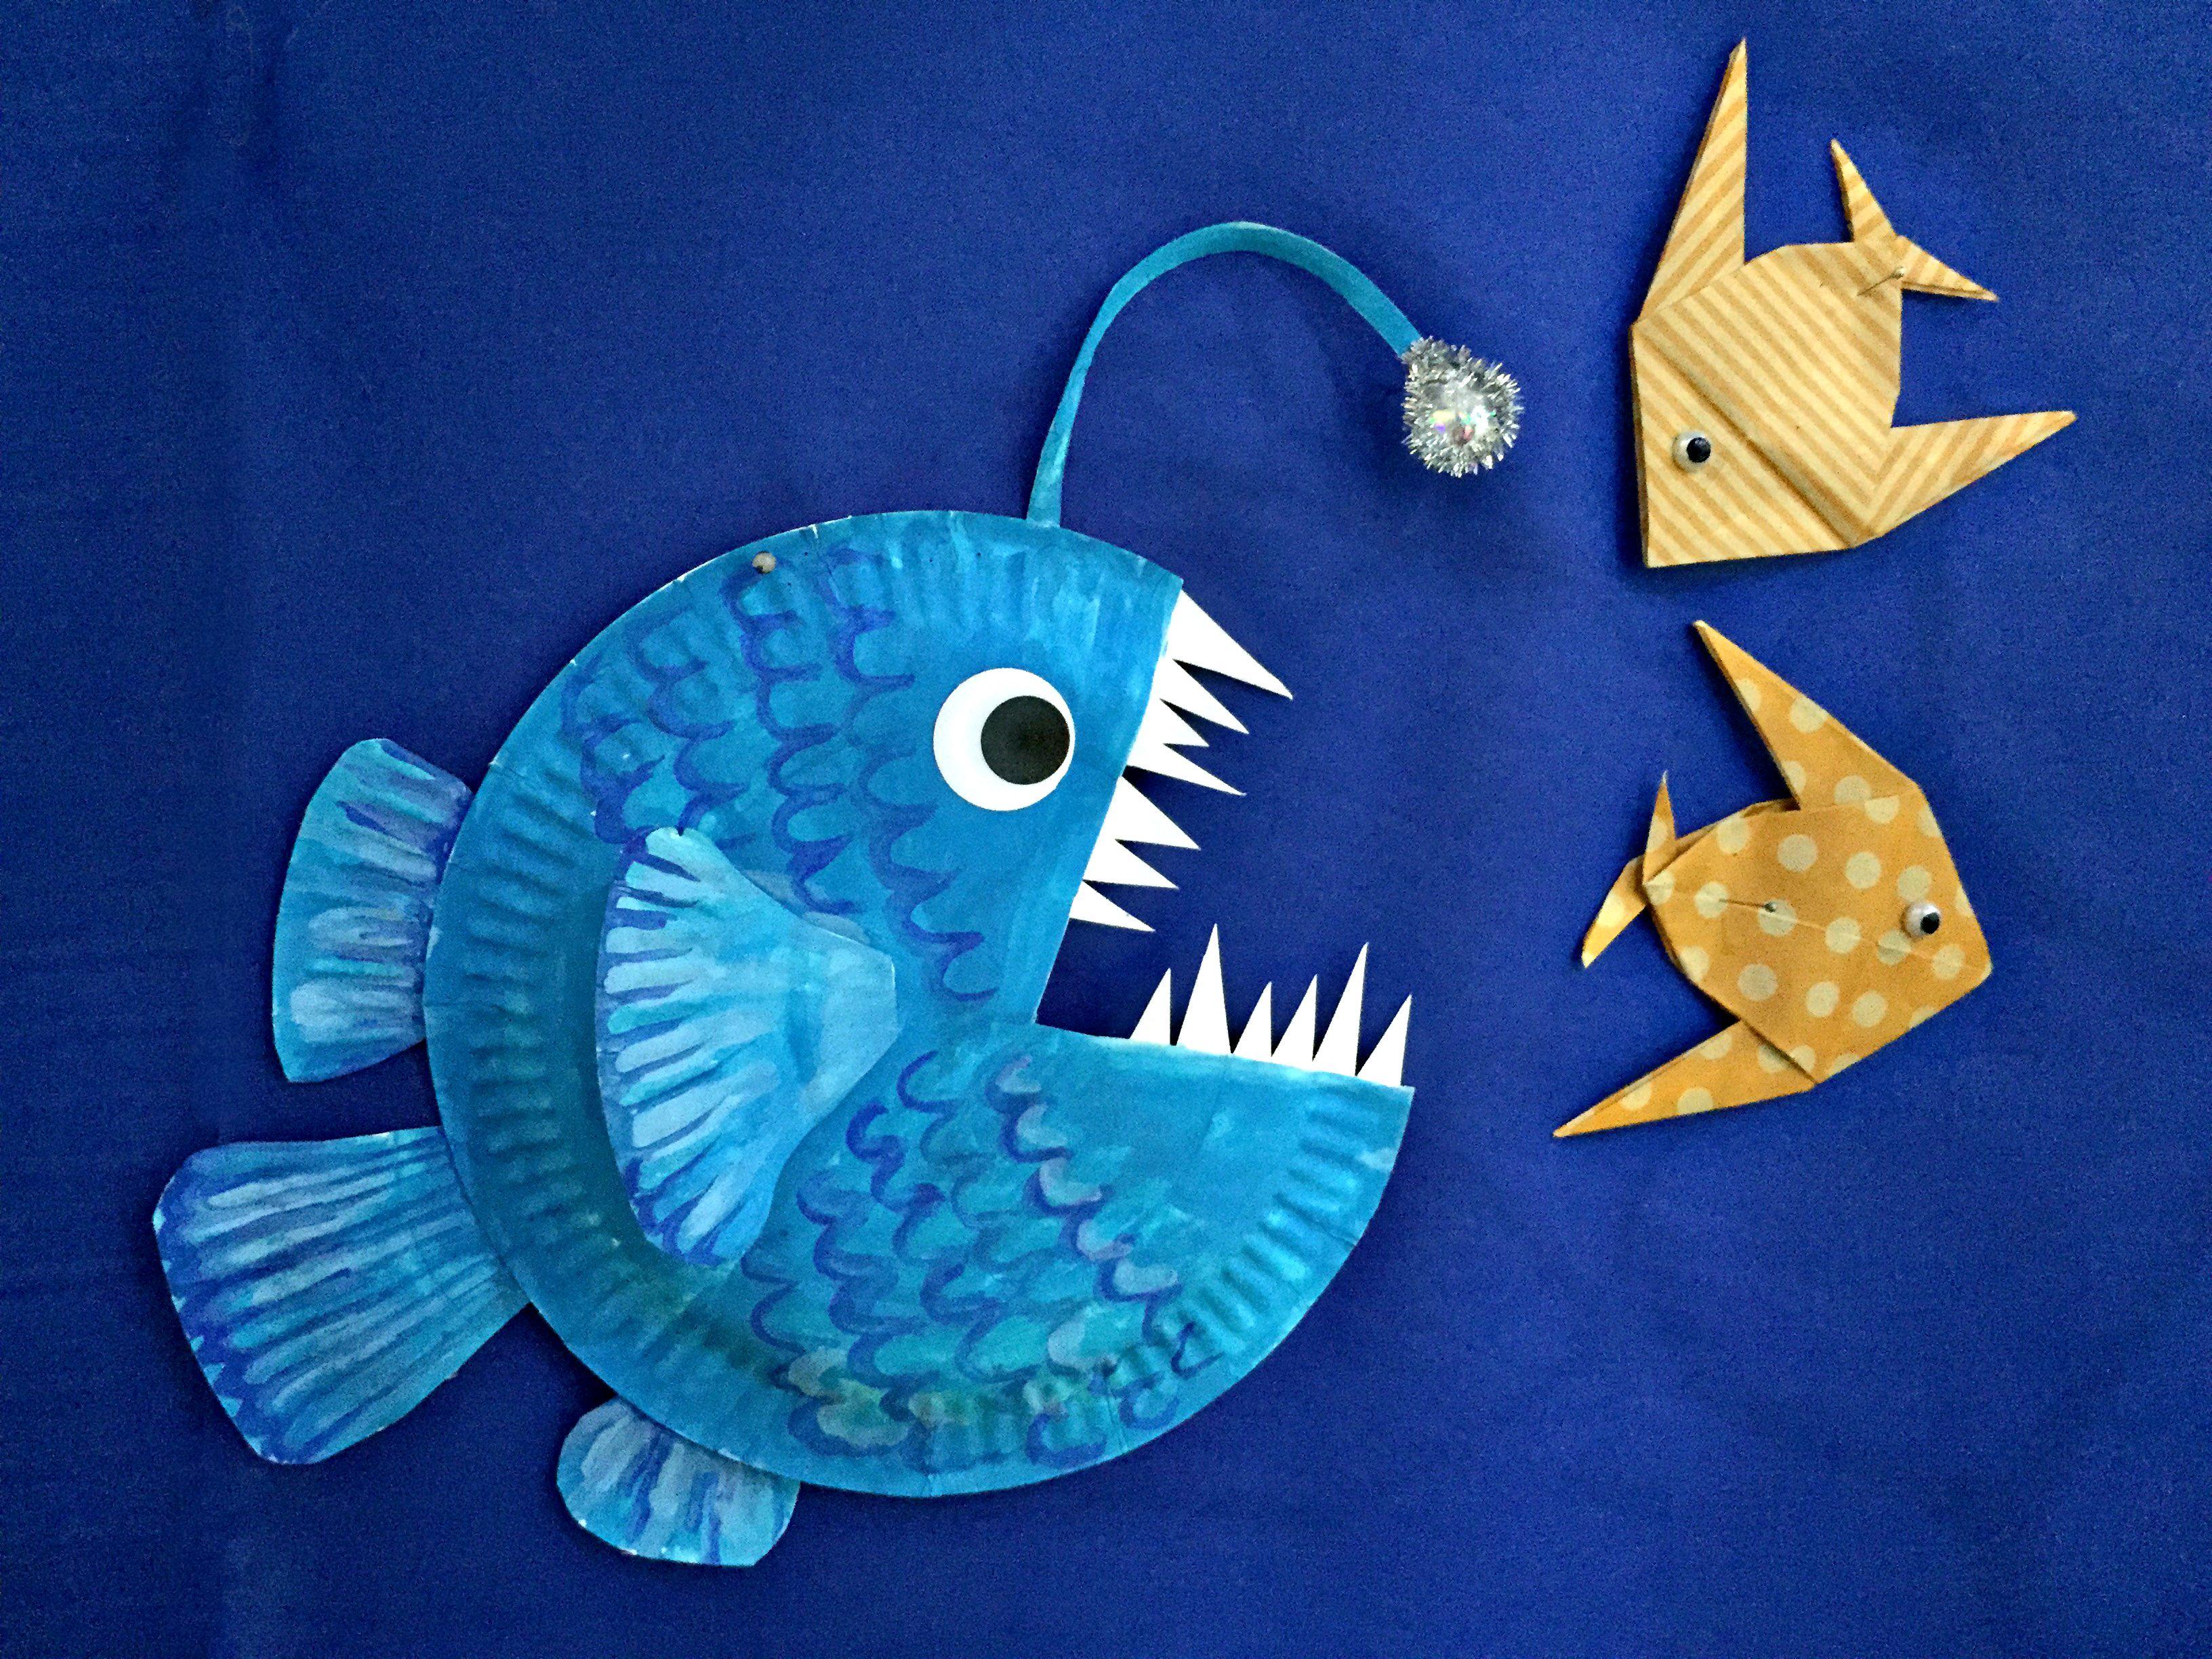 paper plate lantern fish and origami angelfish & paper plate lantern fish and origami angelfish | VBS 2016 ...